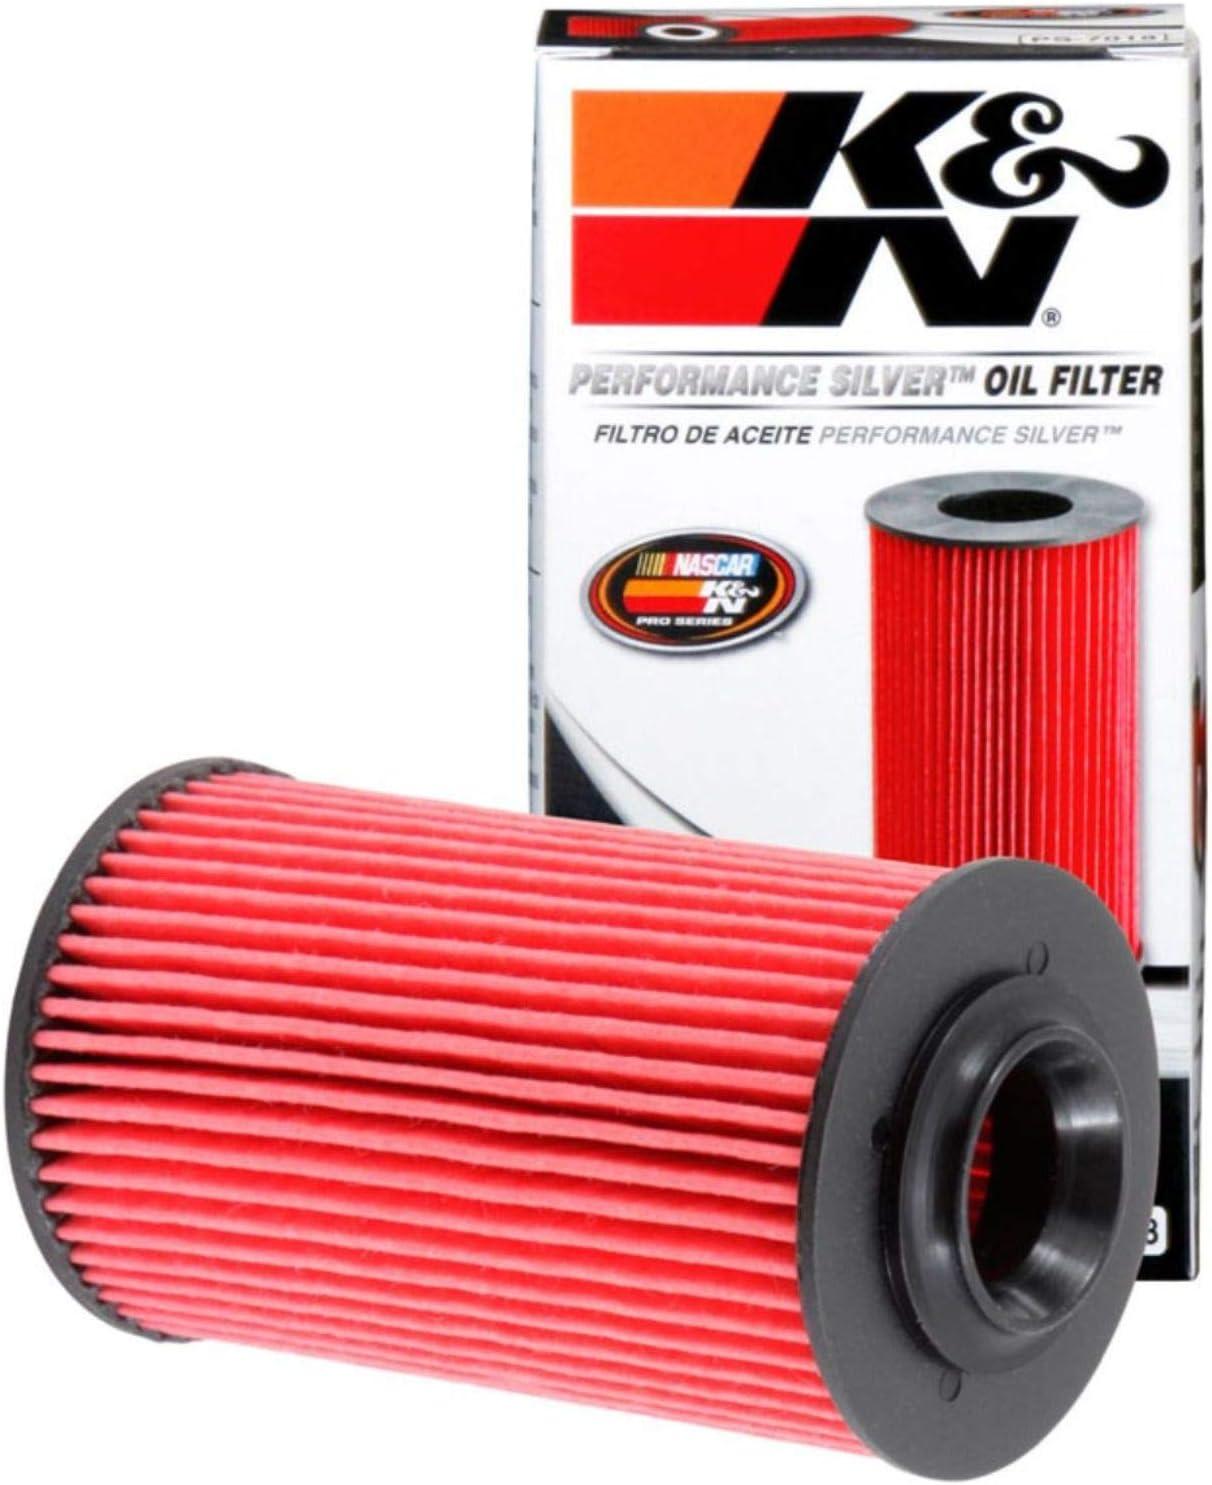 K N Ps 7003 Kfz Ölfilter Auto